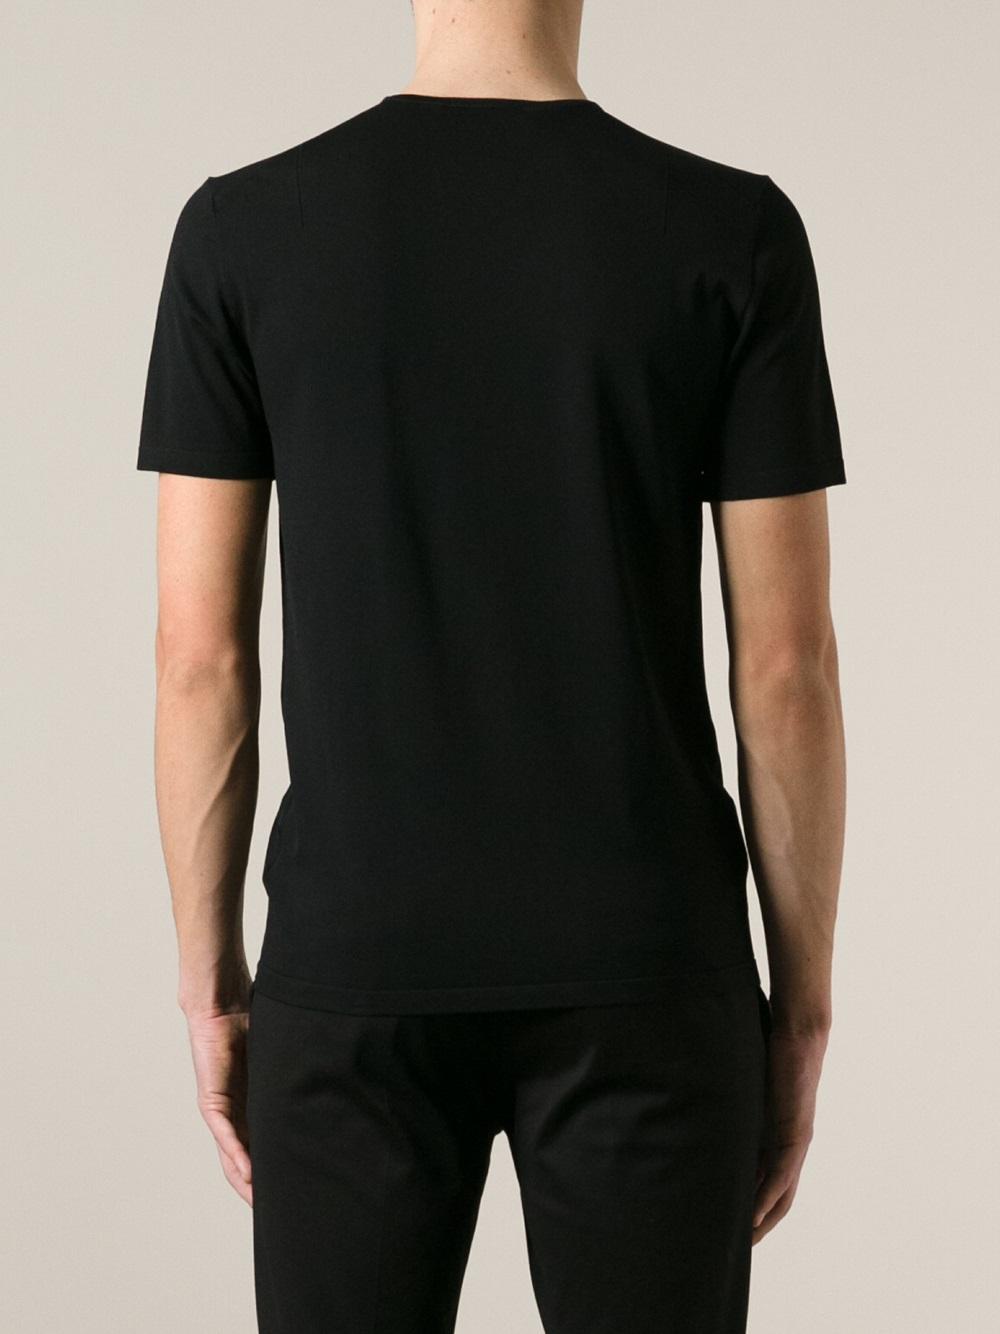 Plain black t shirt quality - Gallery